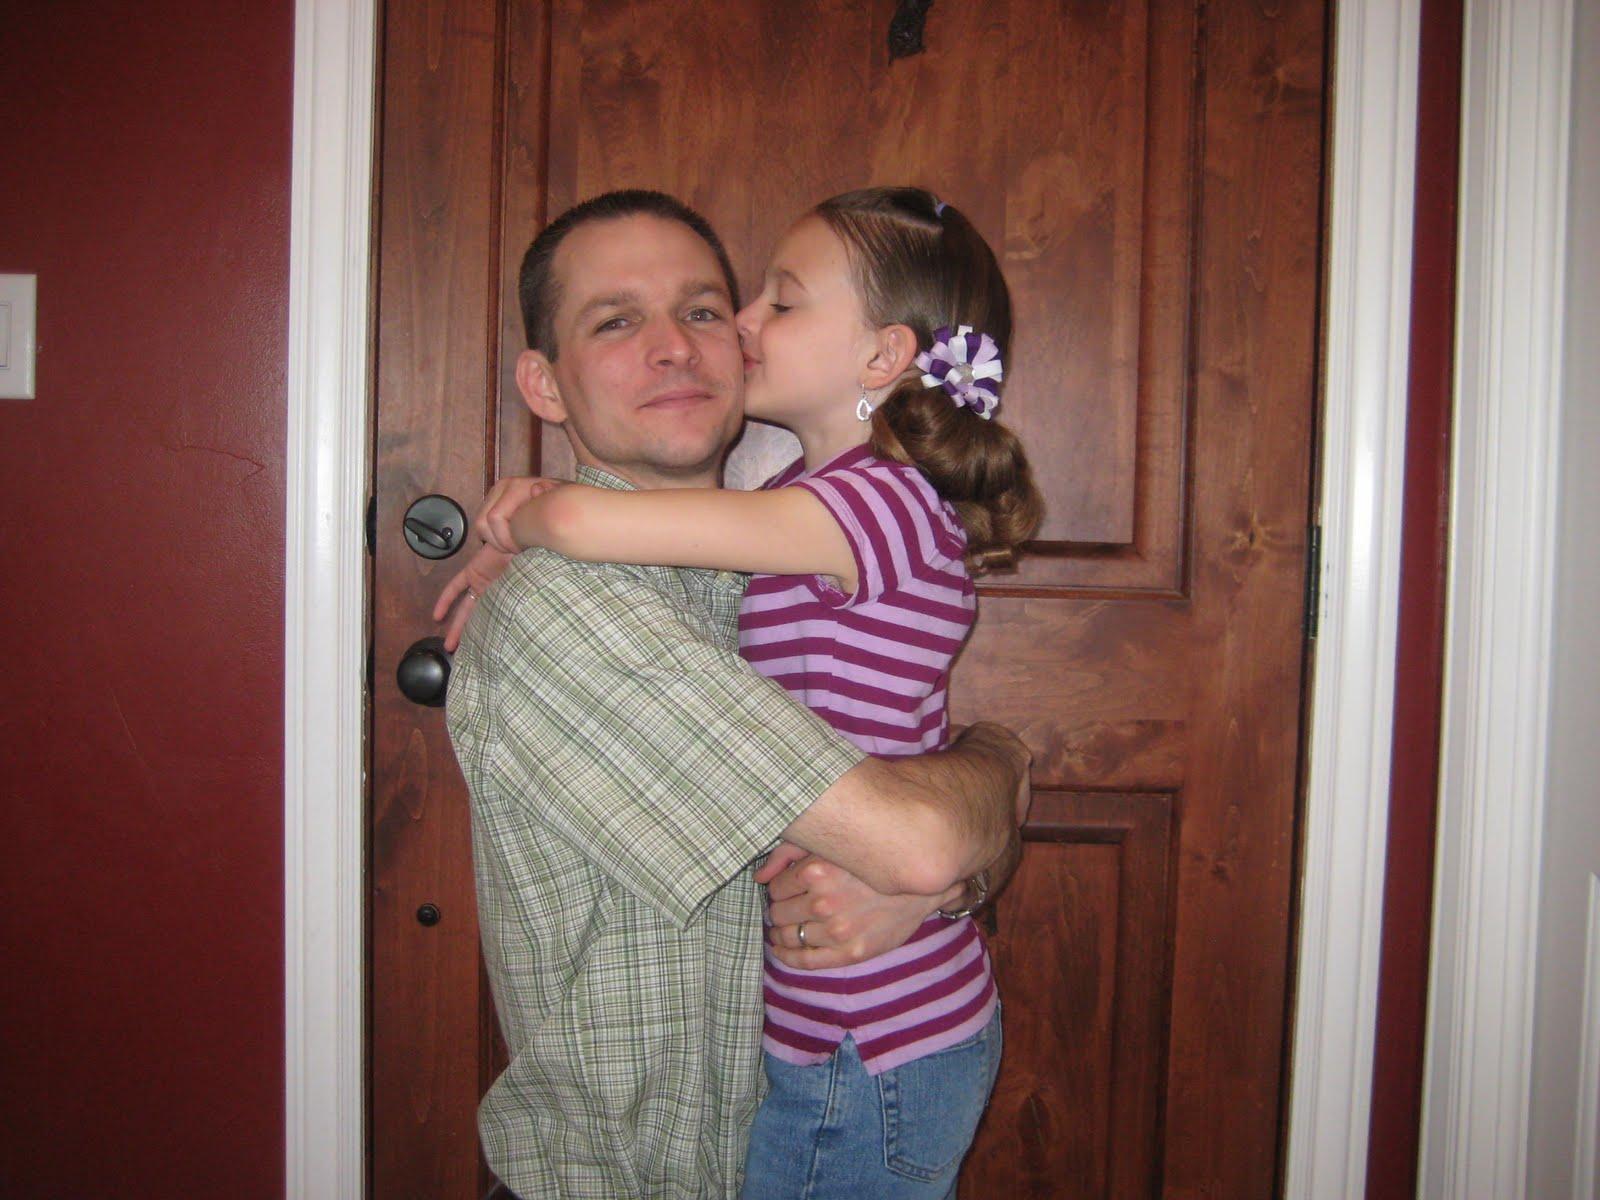 Daughter sucks father